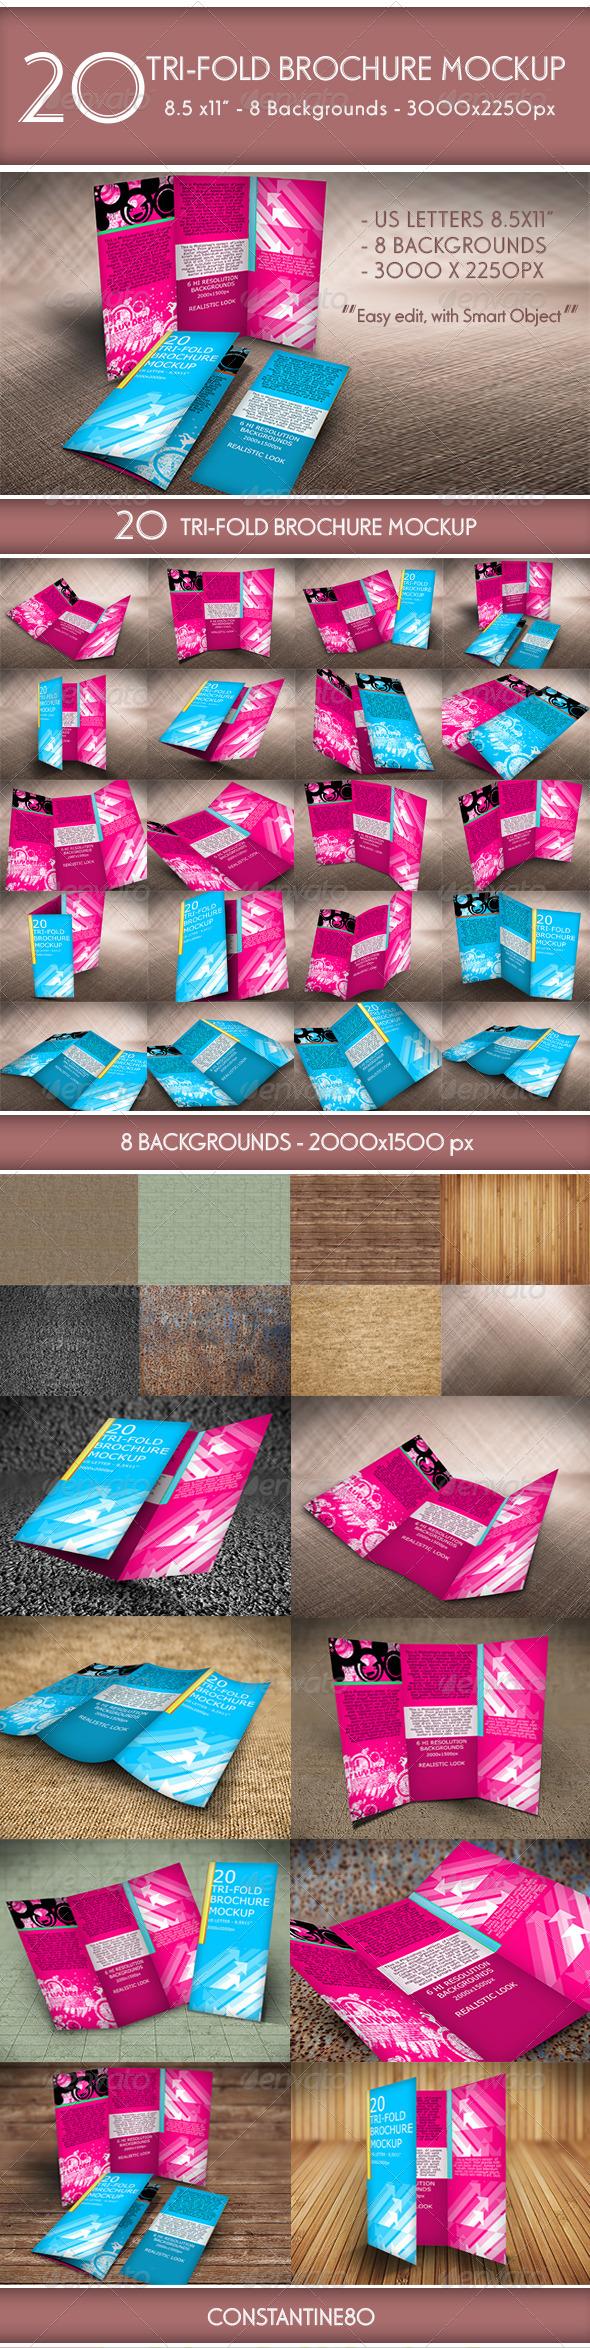 20 Trifold Brochure MockUp - Brochures Print